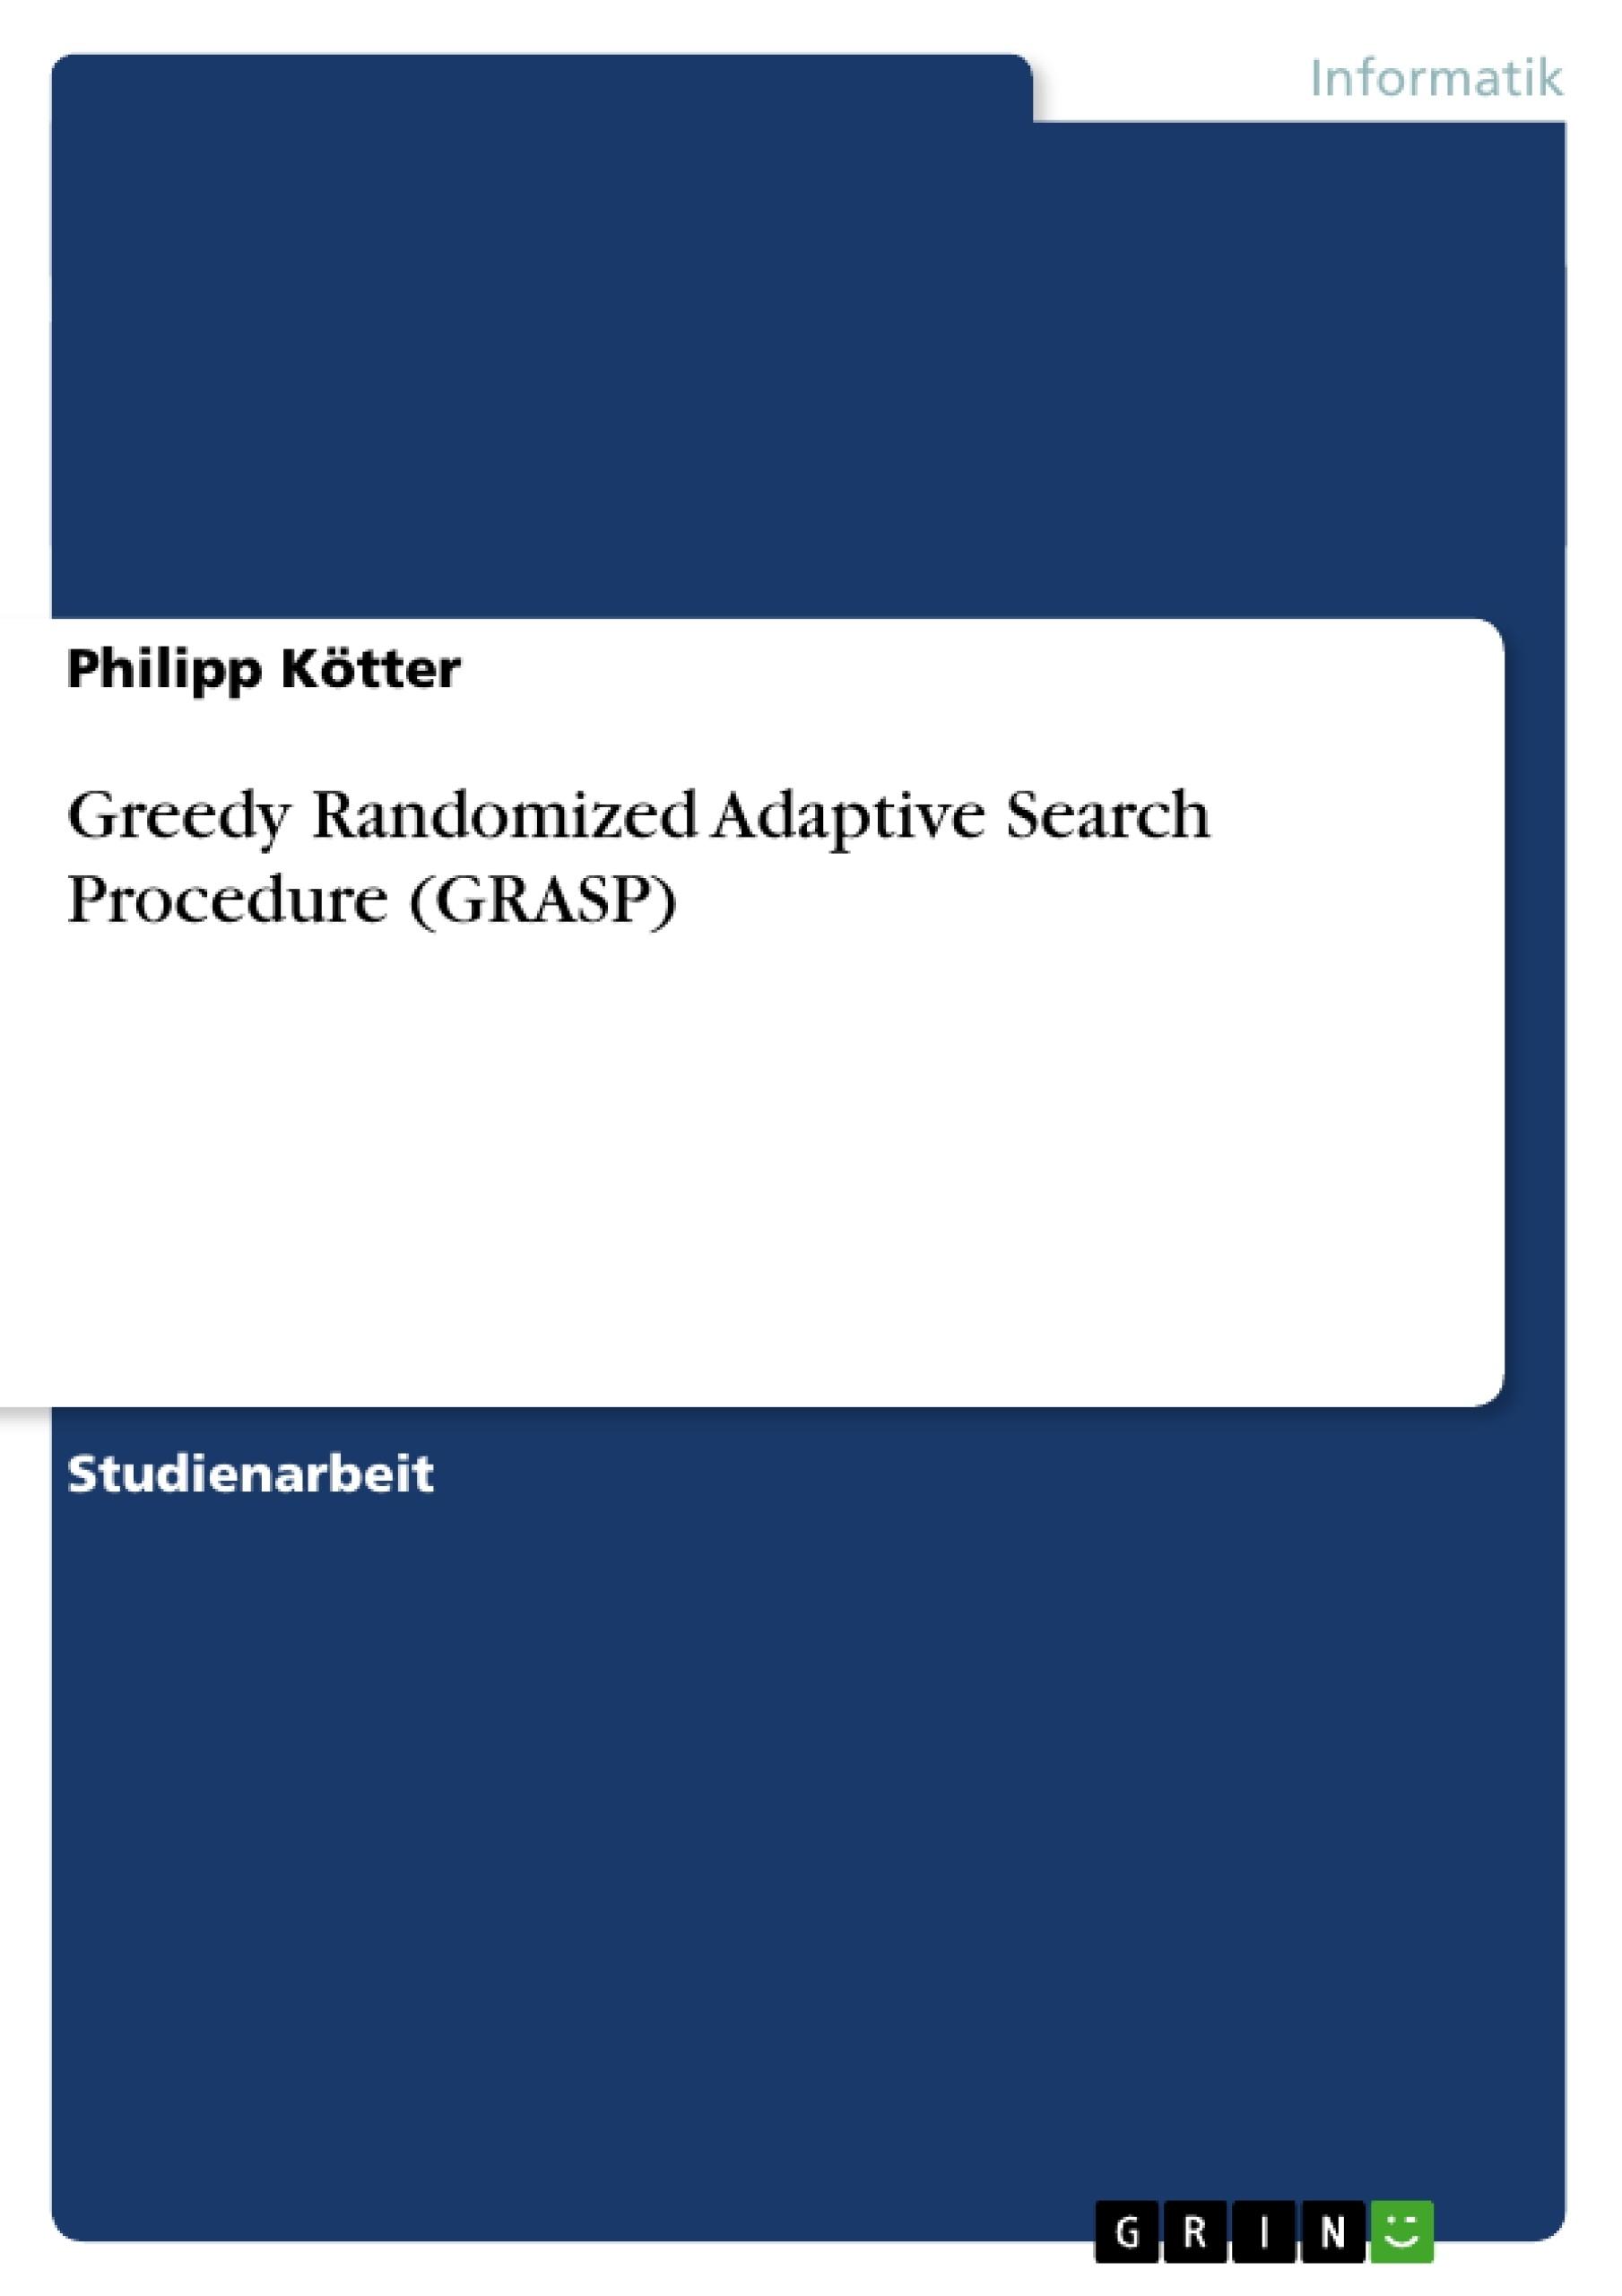 Titel: Greedy Randomized Adaptive Search Procedure (GRASP)